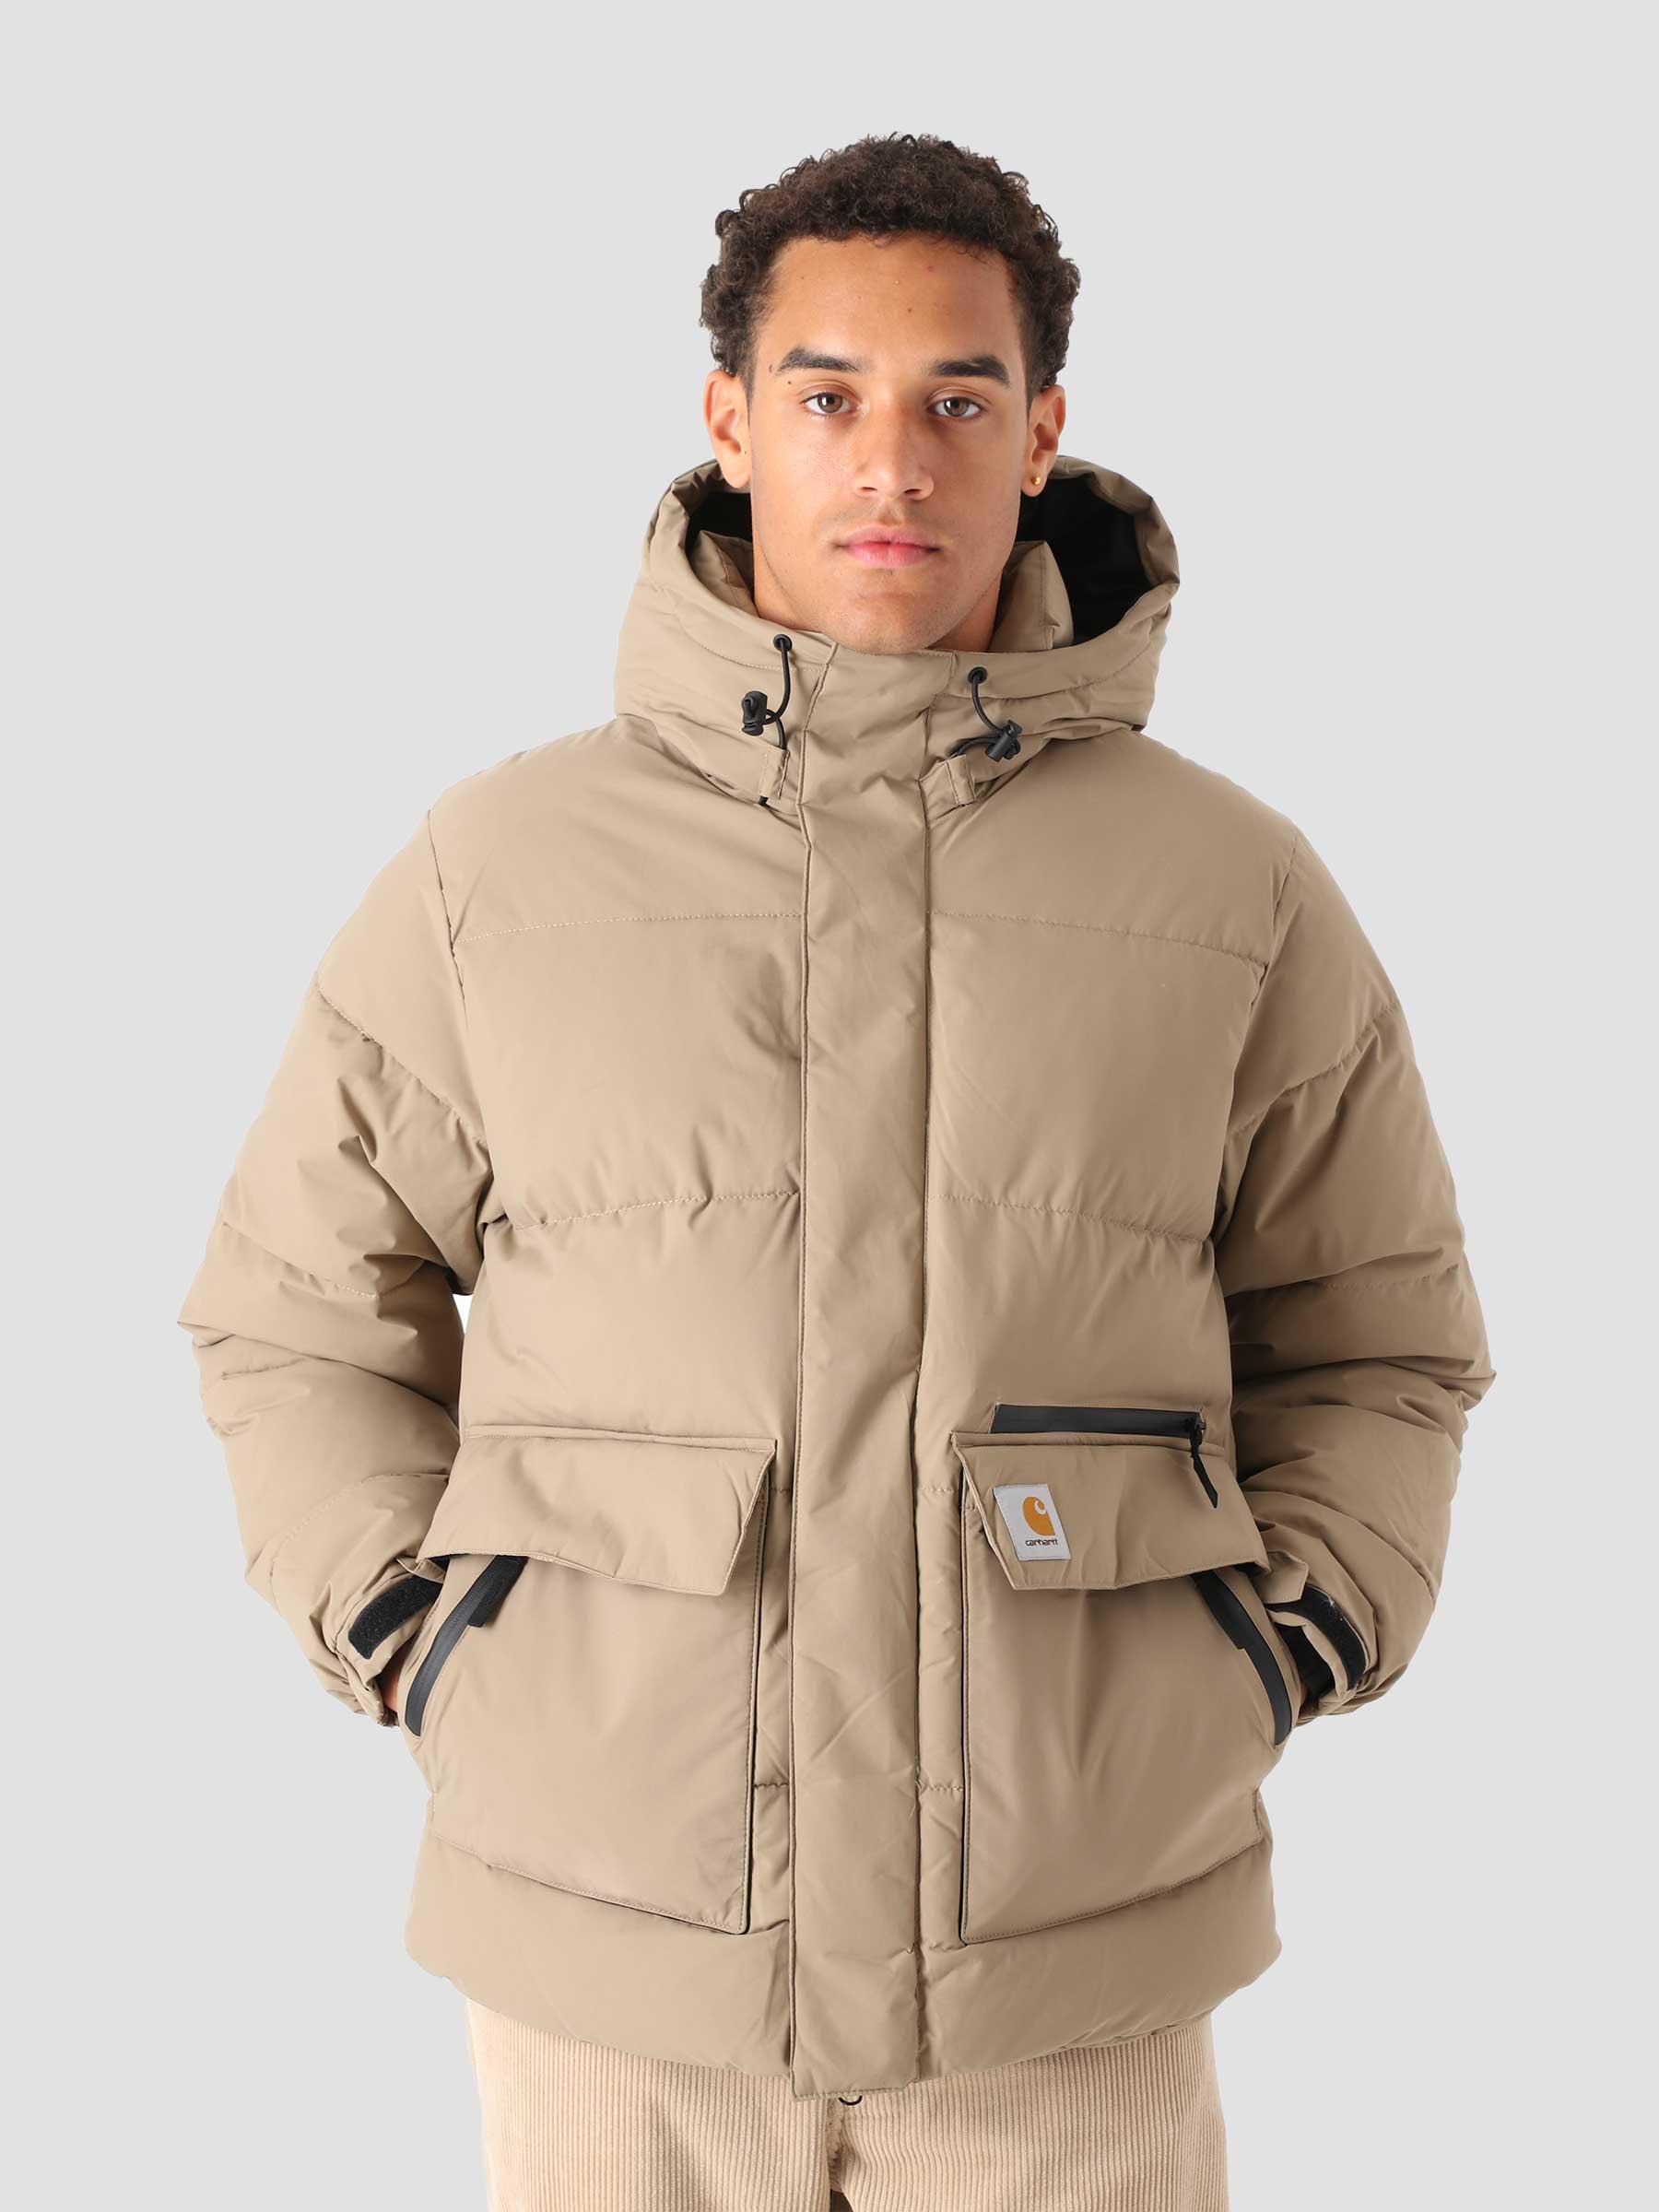 Munro Jacket Tanami I029449